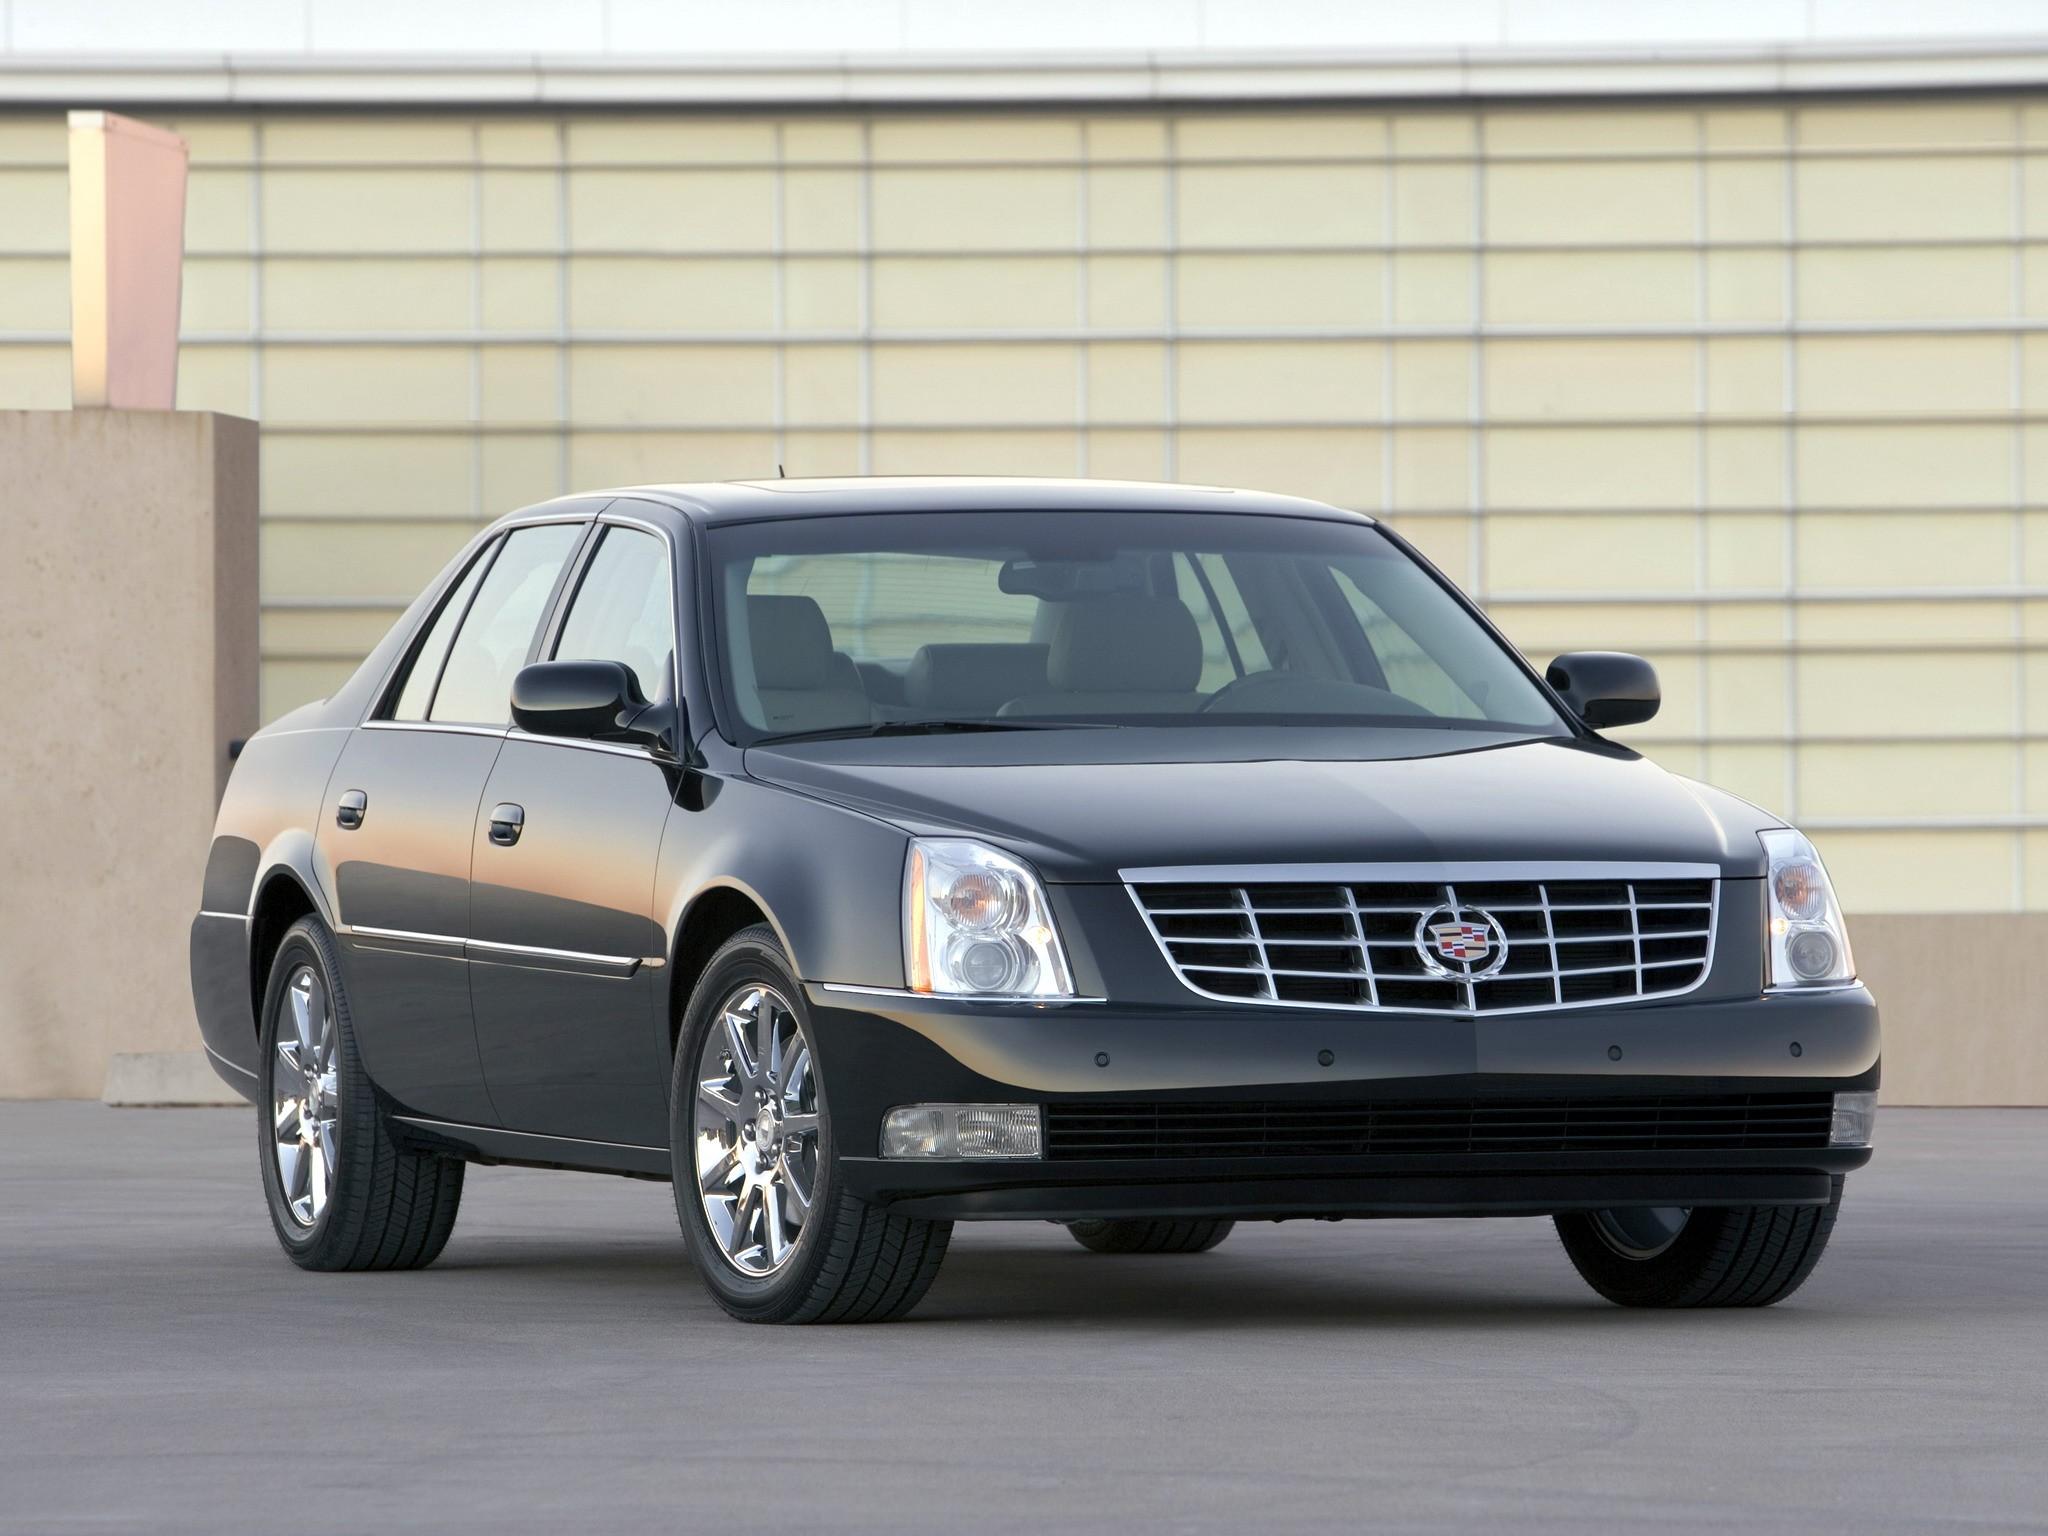 photos sedan price cadillac reviews engine features dts exterior